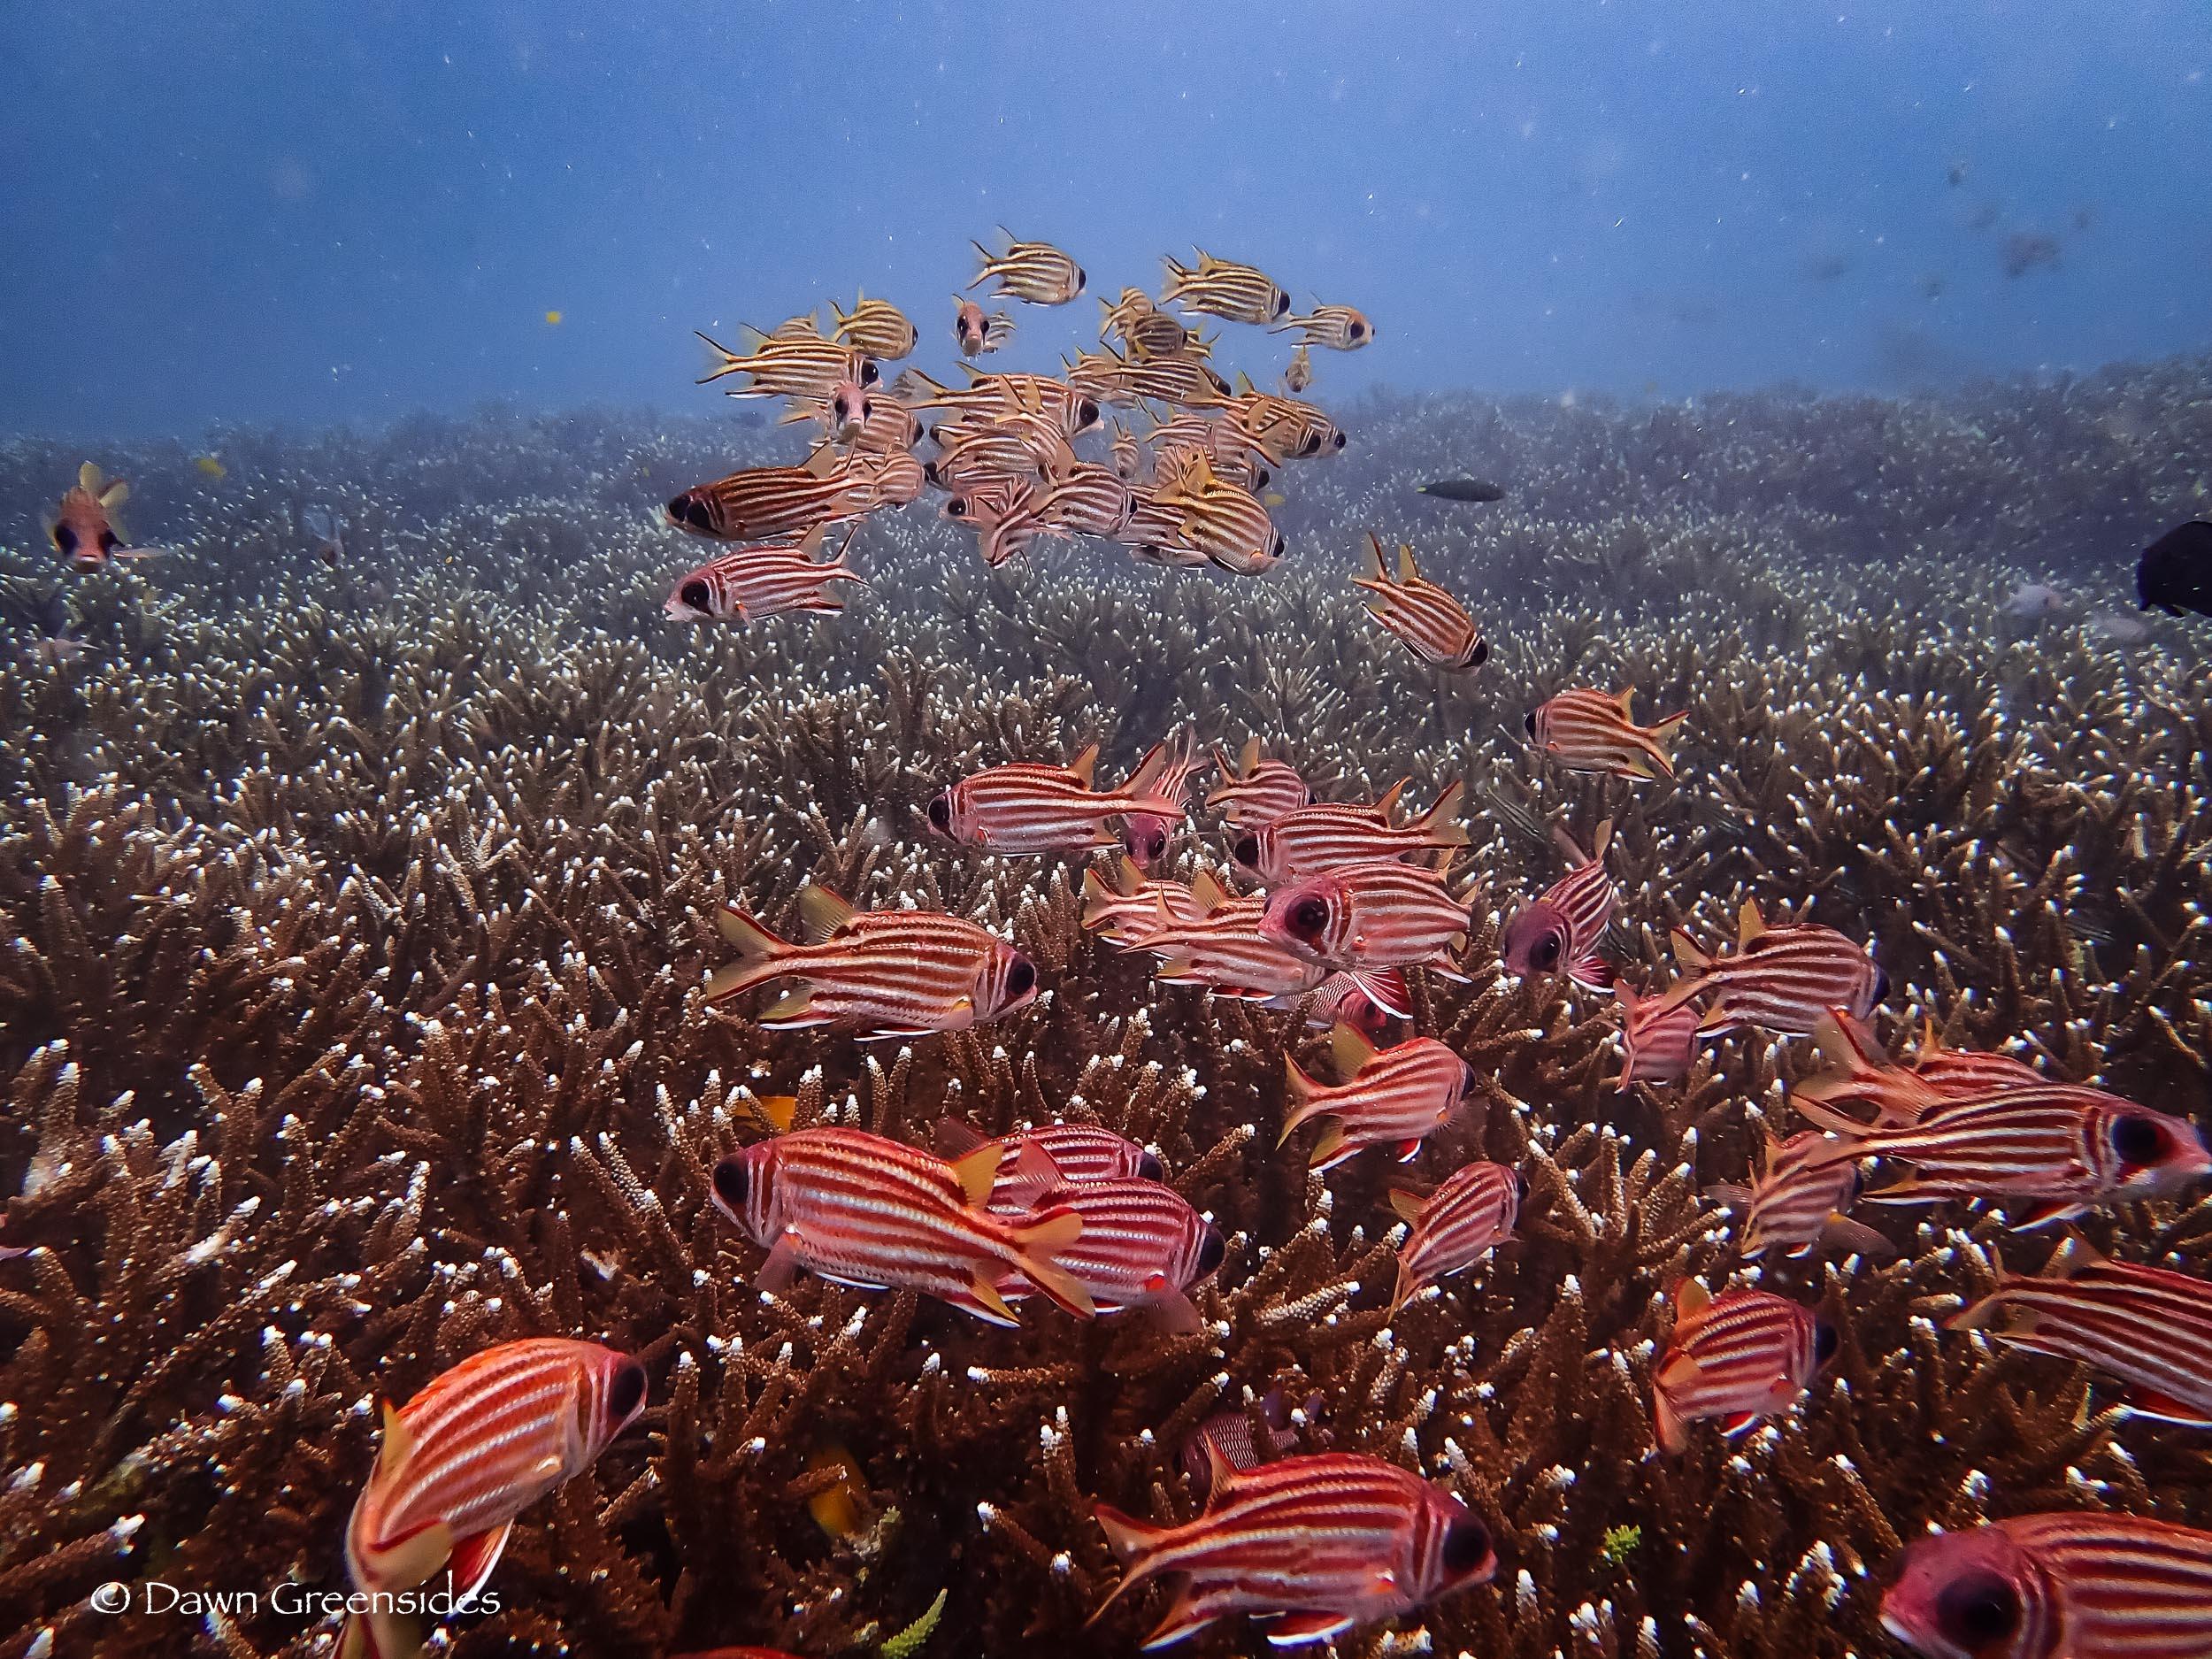 Diving-12.jpg